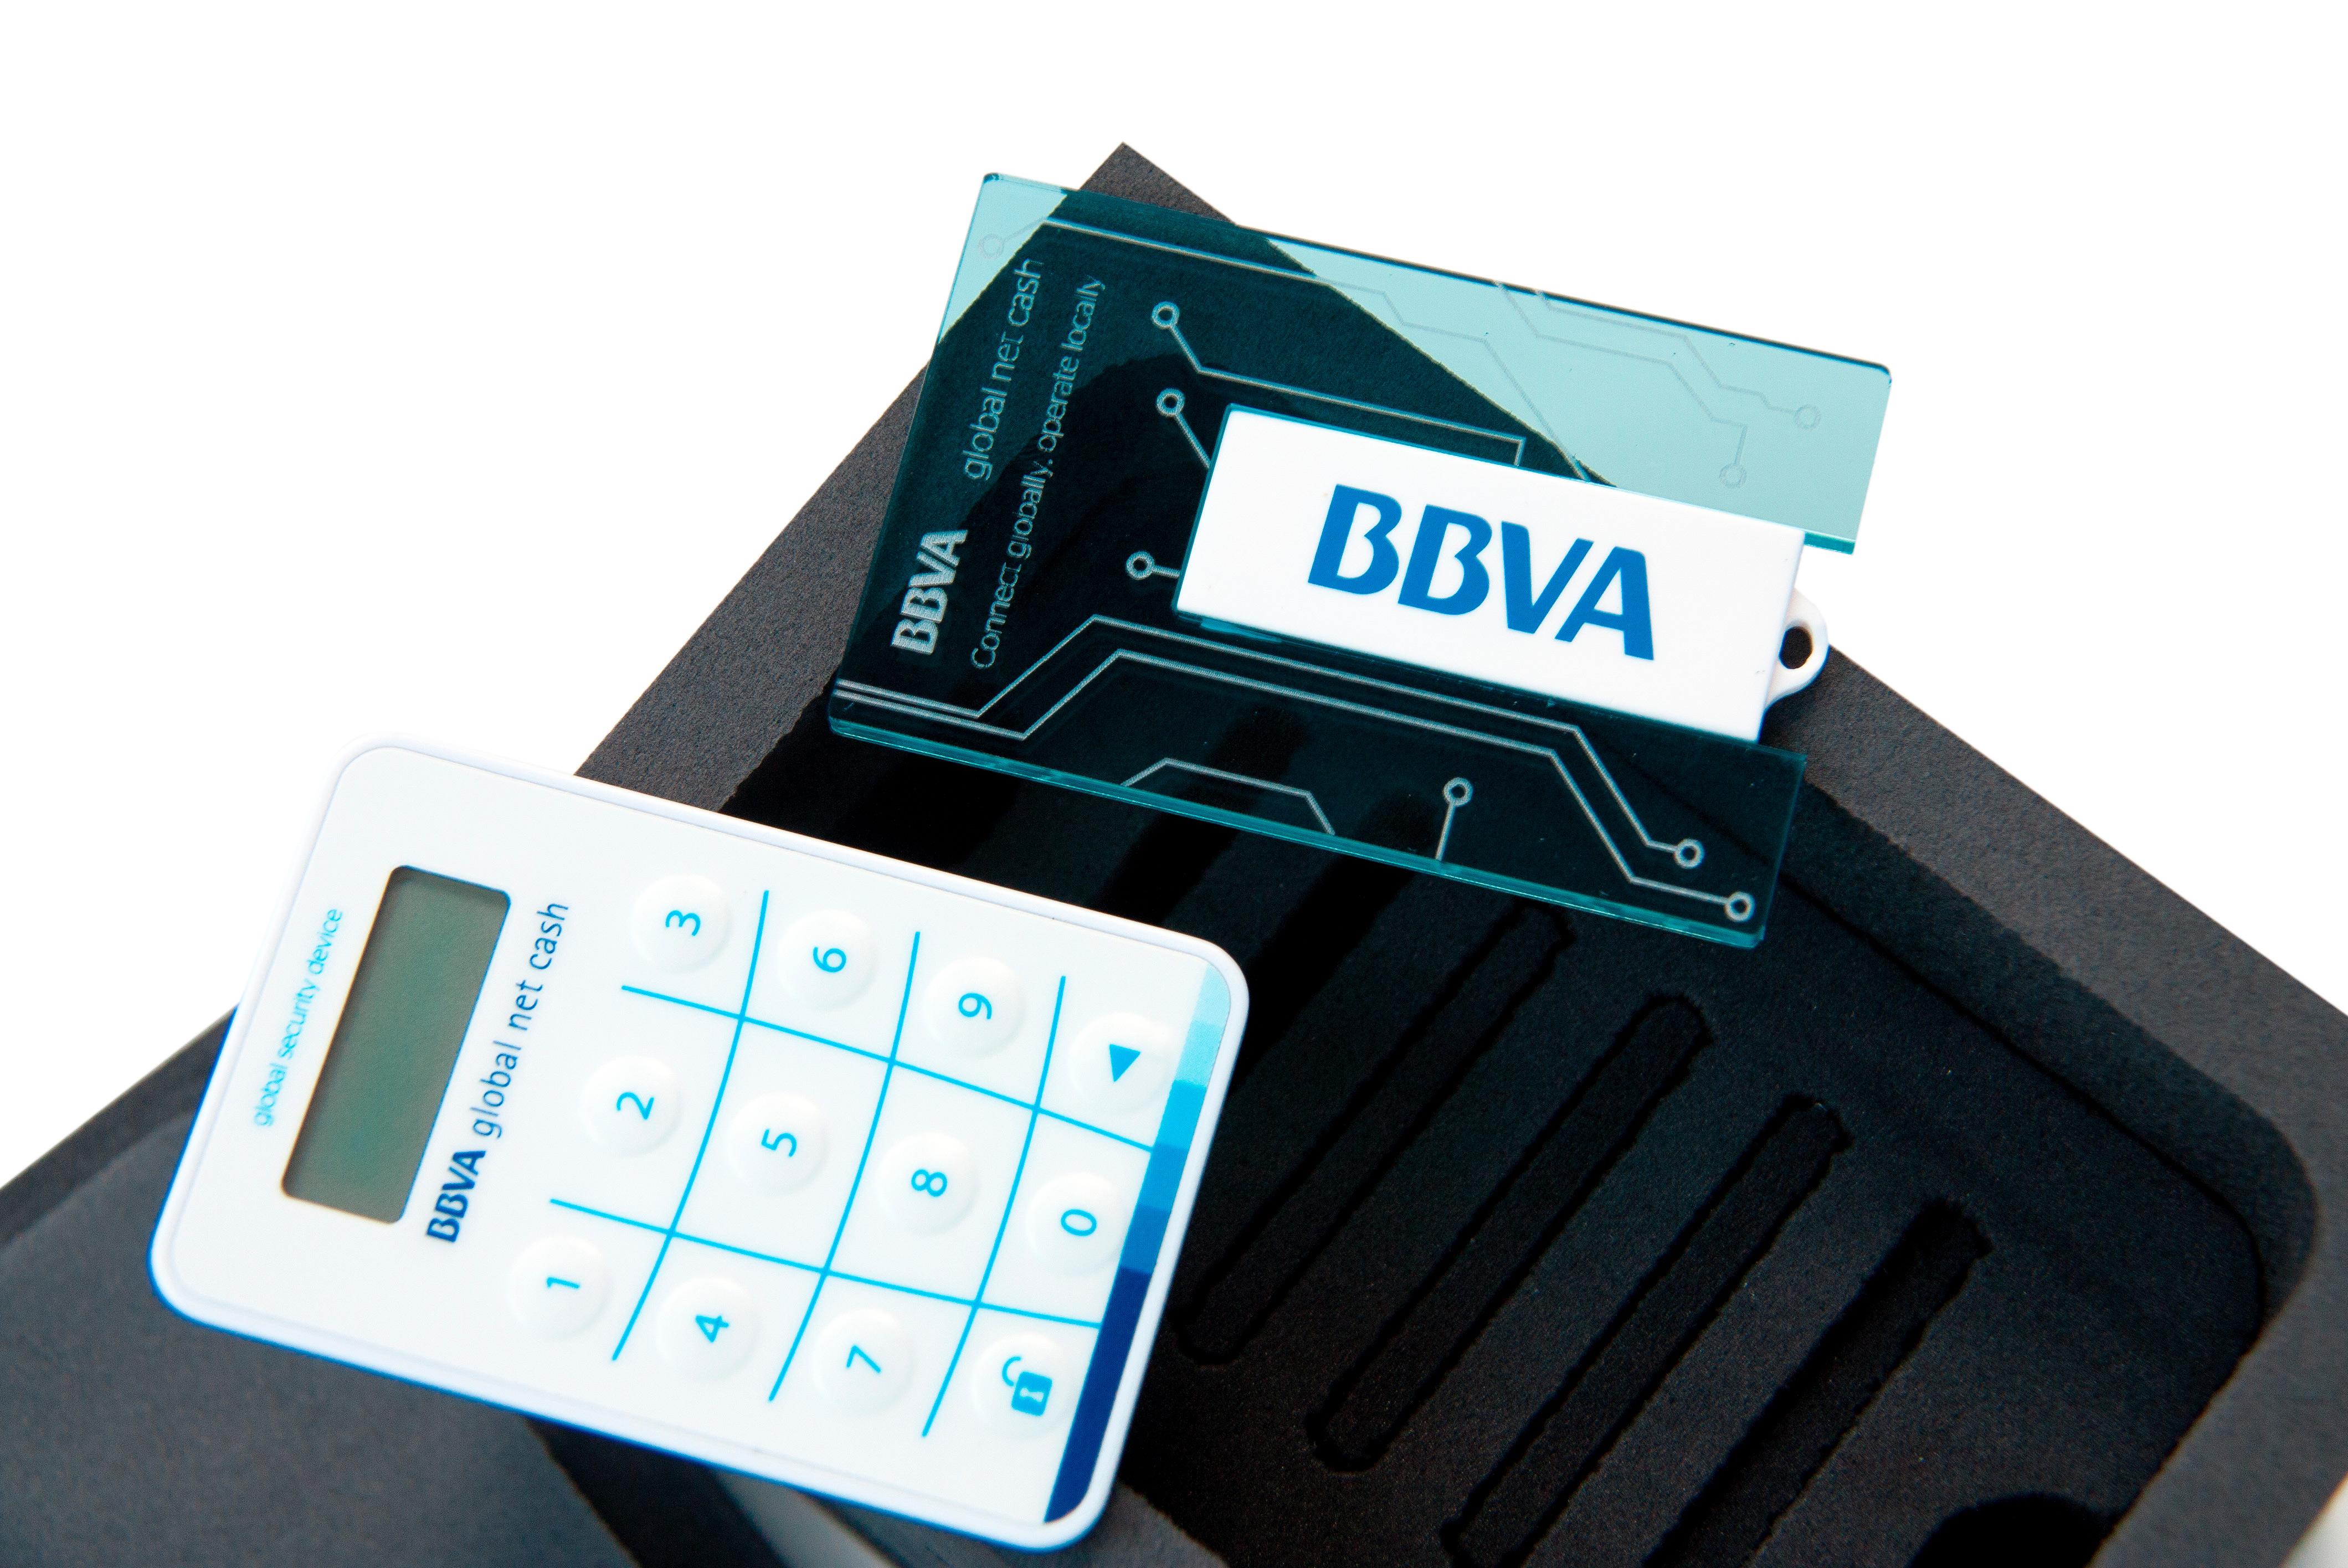 Packaging BBVA Global Net cash by aktuart - Mikel Rico - Creative Work - $i